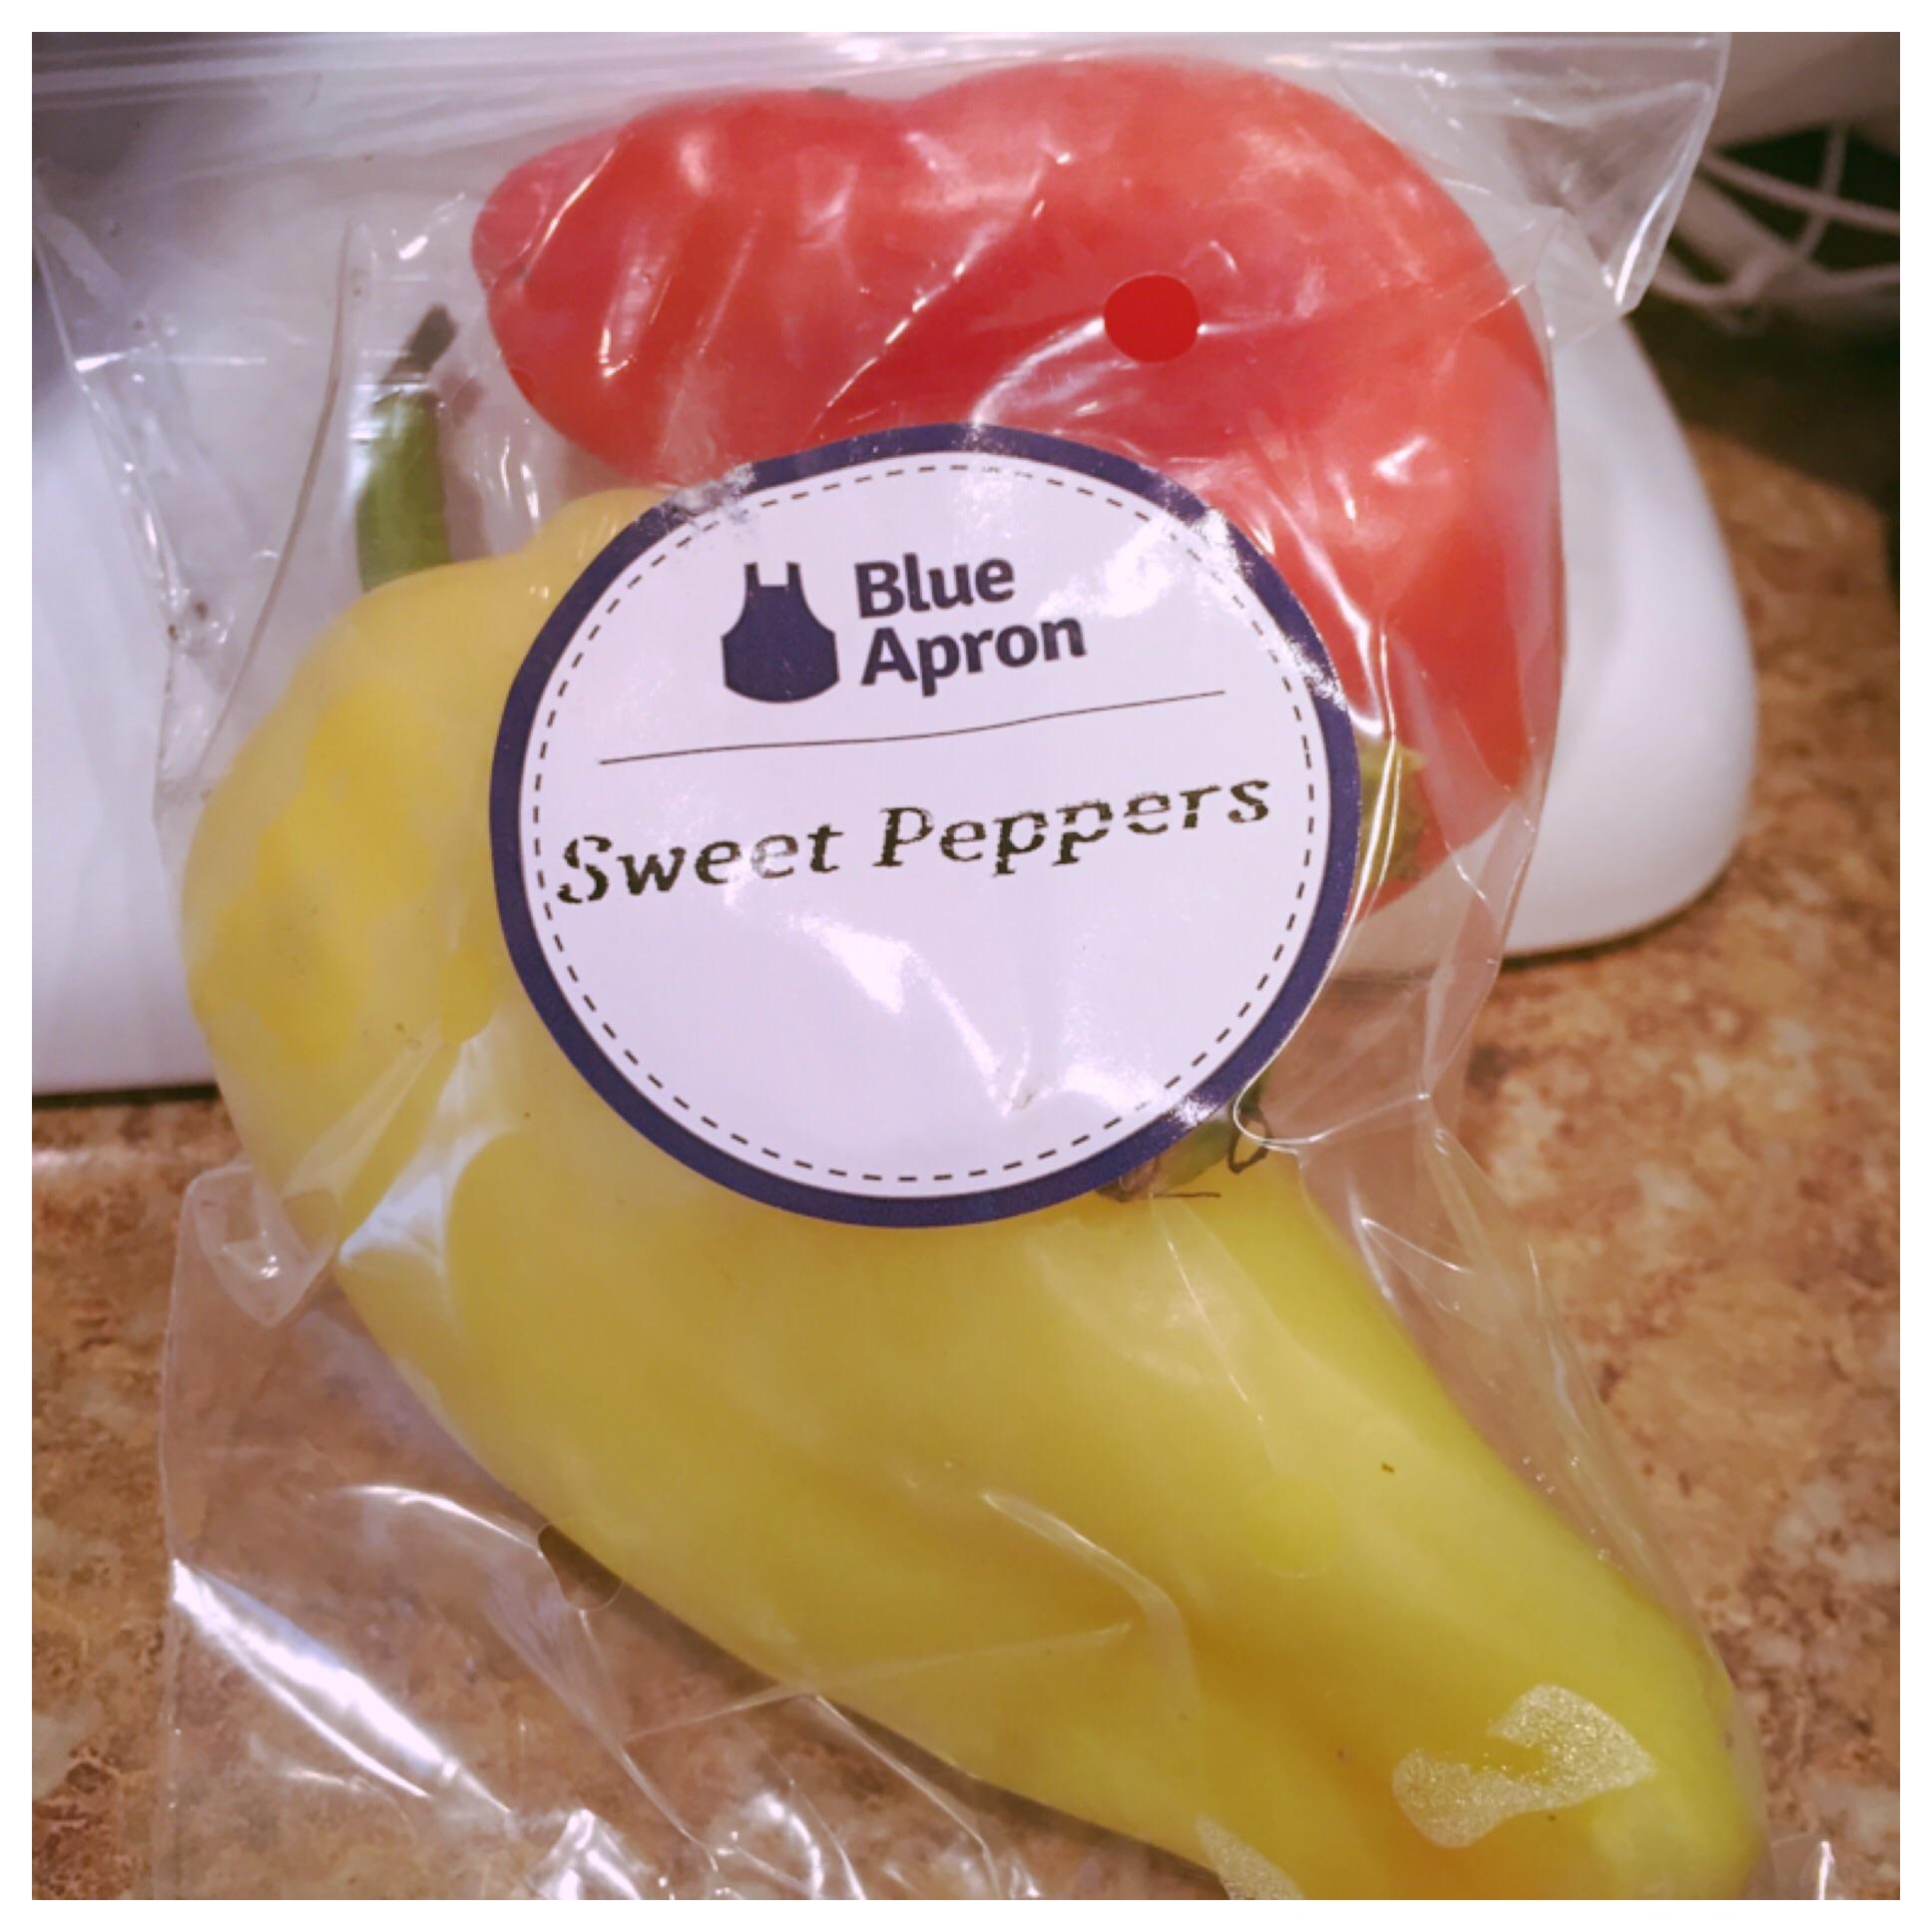 Blue apron za'atar - Blue Apron Sweet Pepper Image